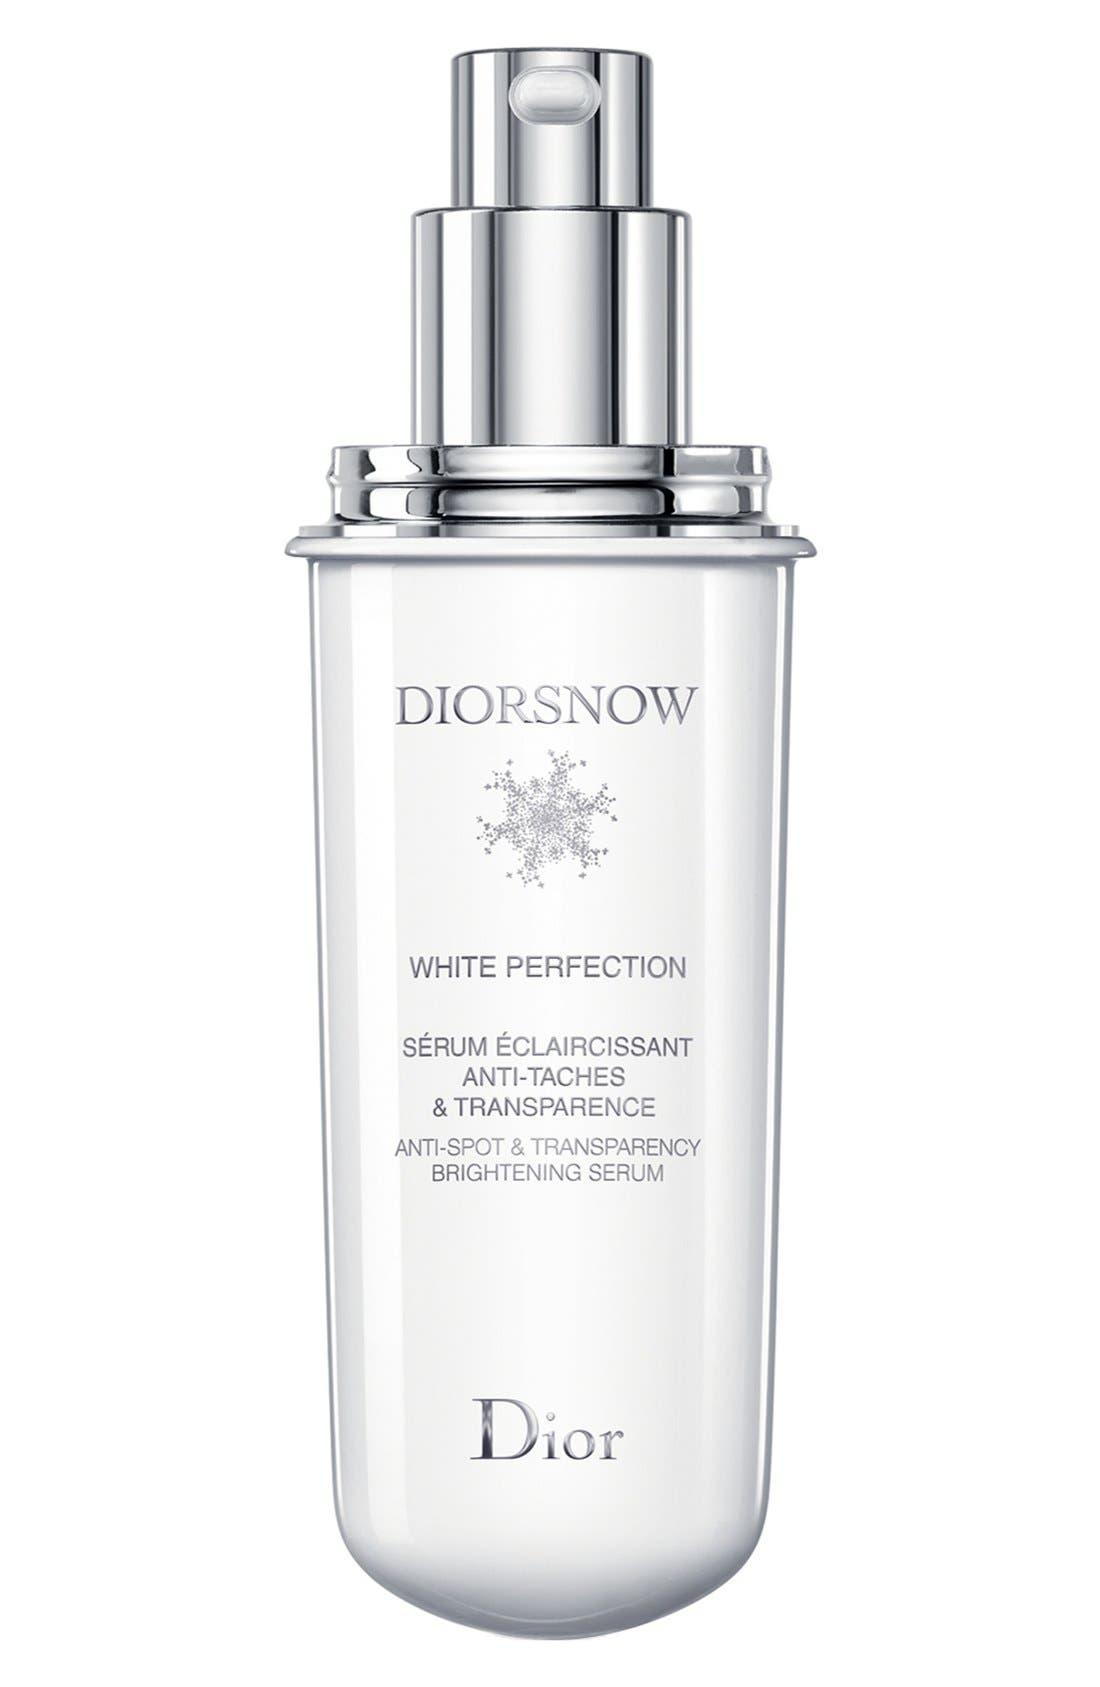 Dior 'Diorsnow' White Perfection Anti-Spot & Transparency Brightening Serum Refill